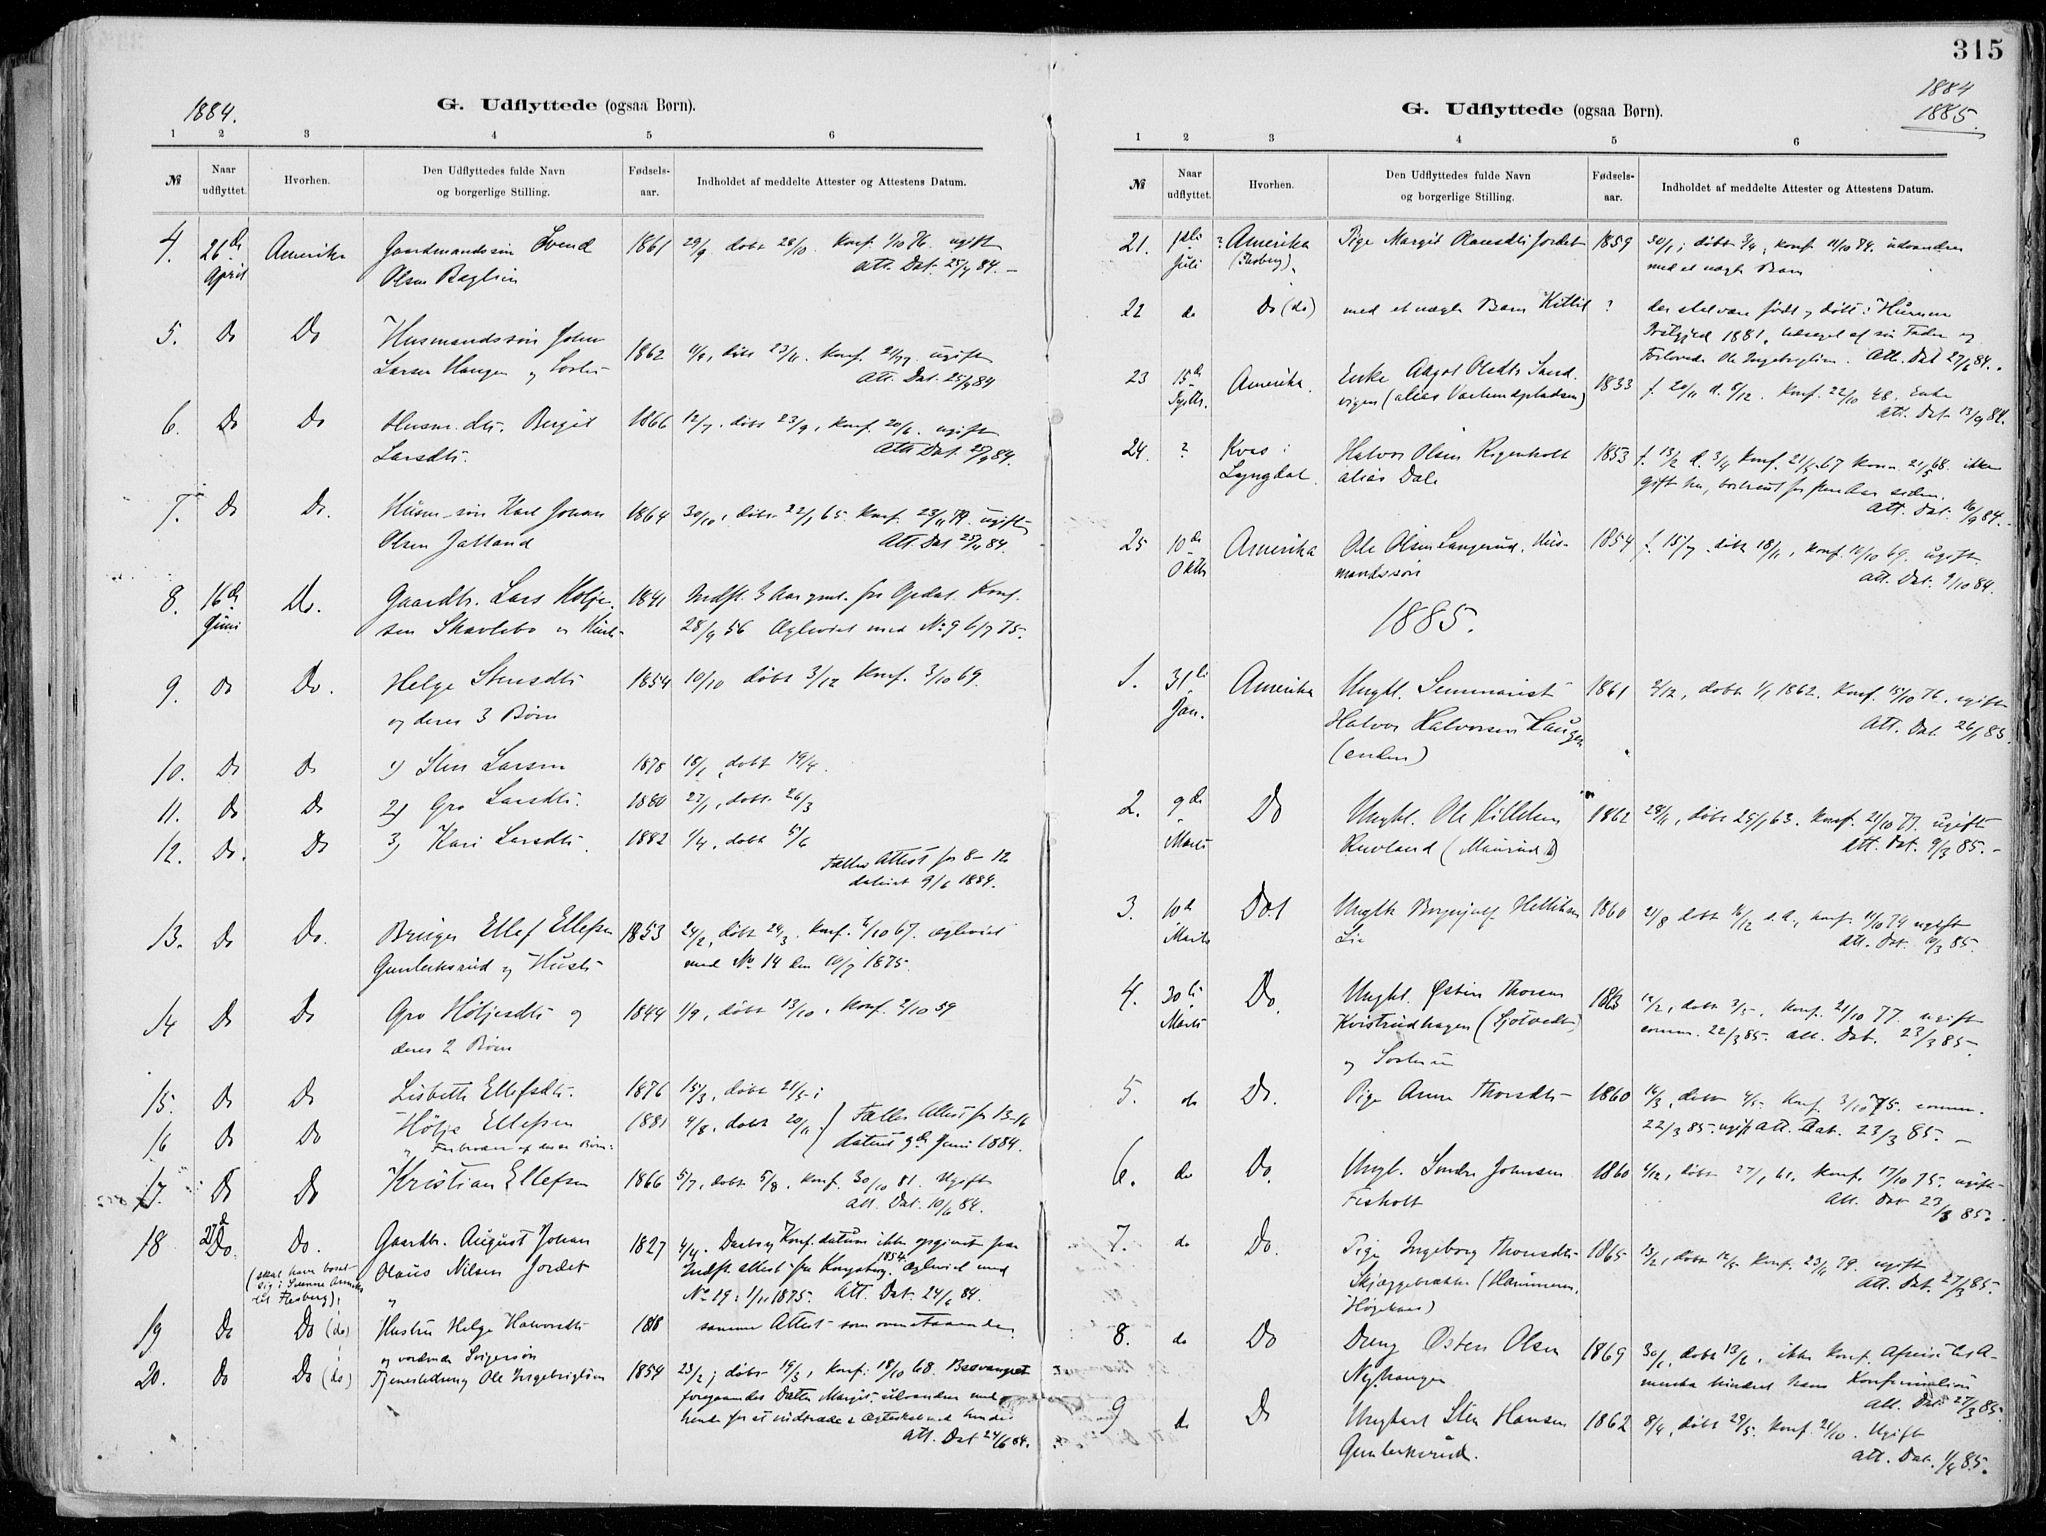 SAKO, Tinn kirkebøker, F/Fa/L0007: Ministerialbok nr. I 7, 1878-1922, s. 315